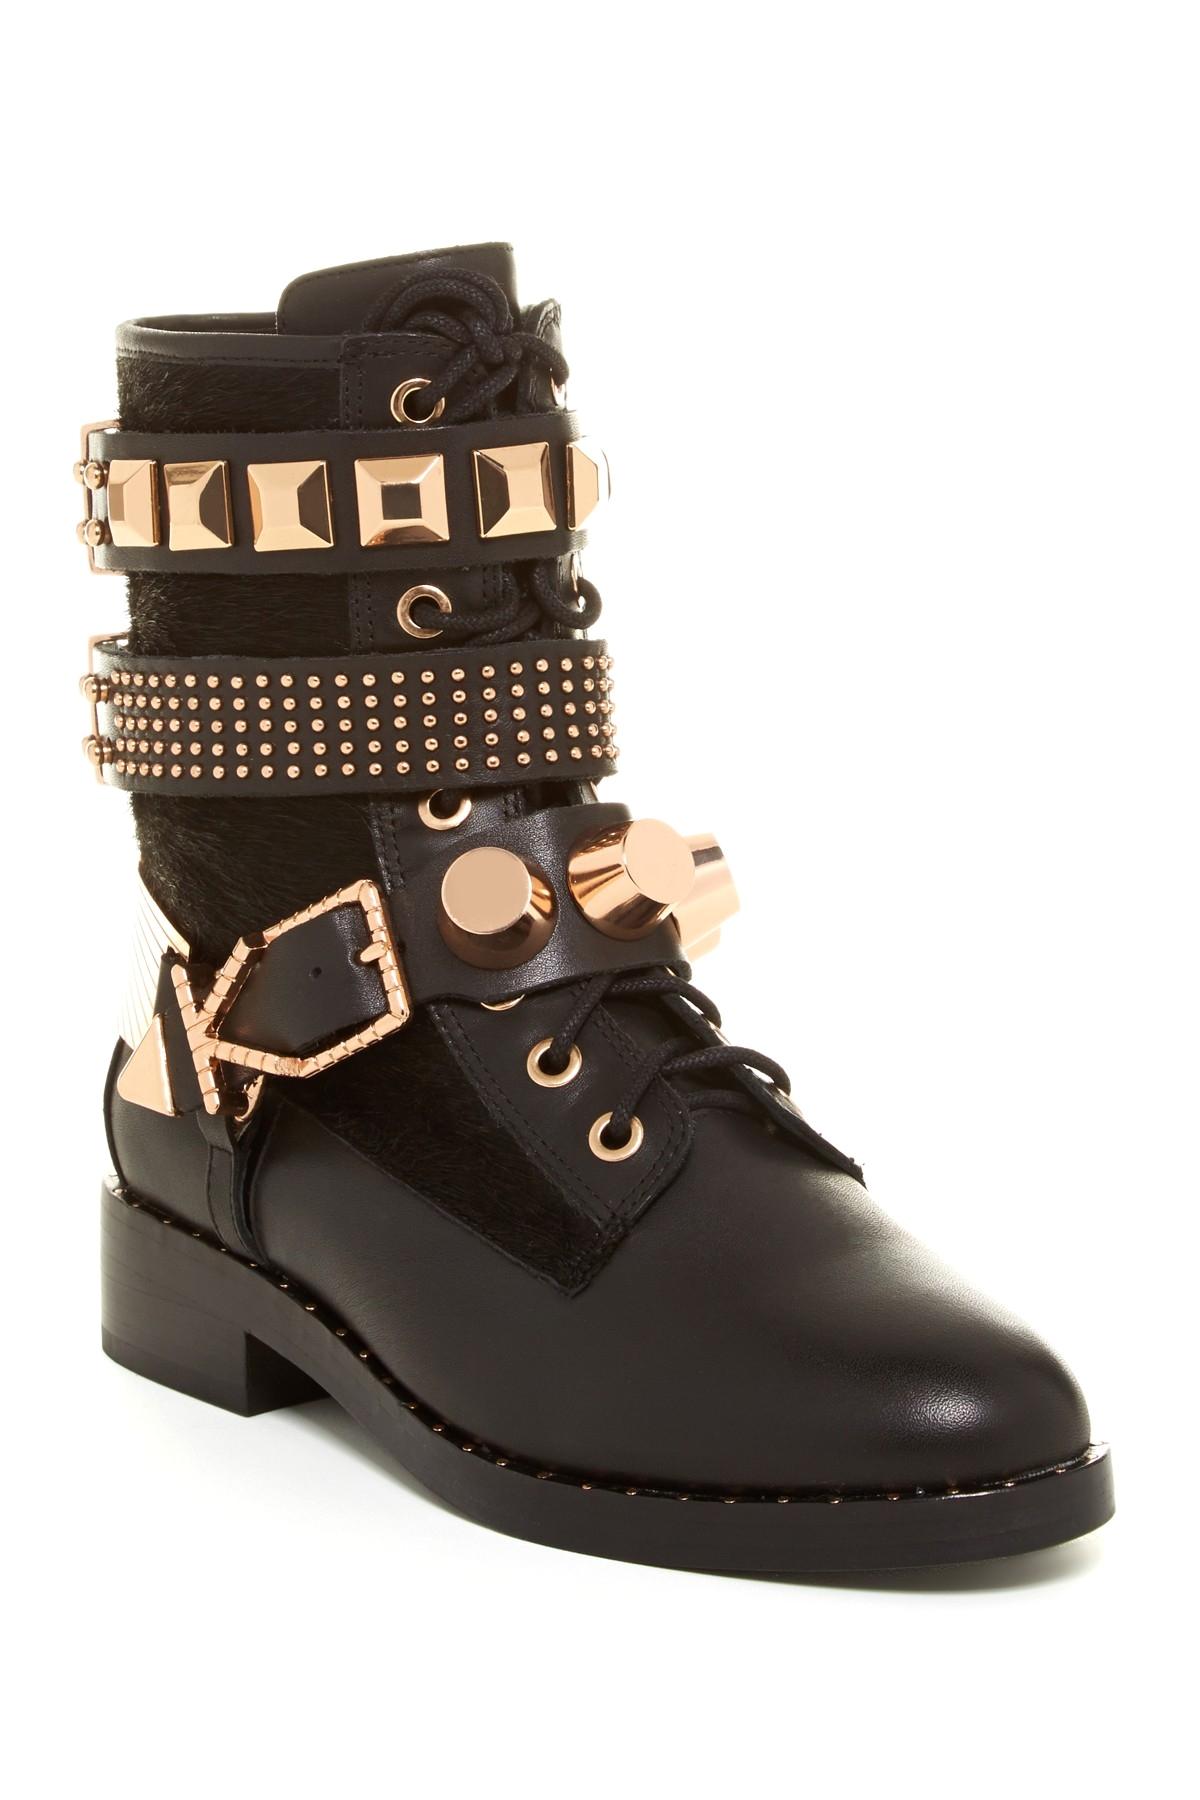 image of ivy kirzhner bowery genuine calf hair studded boot